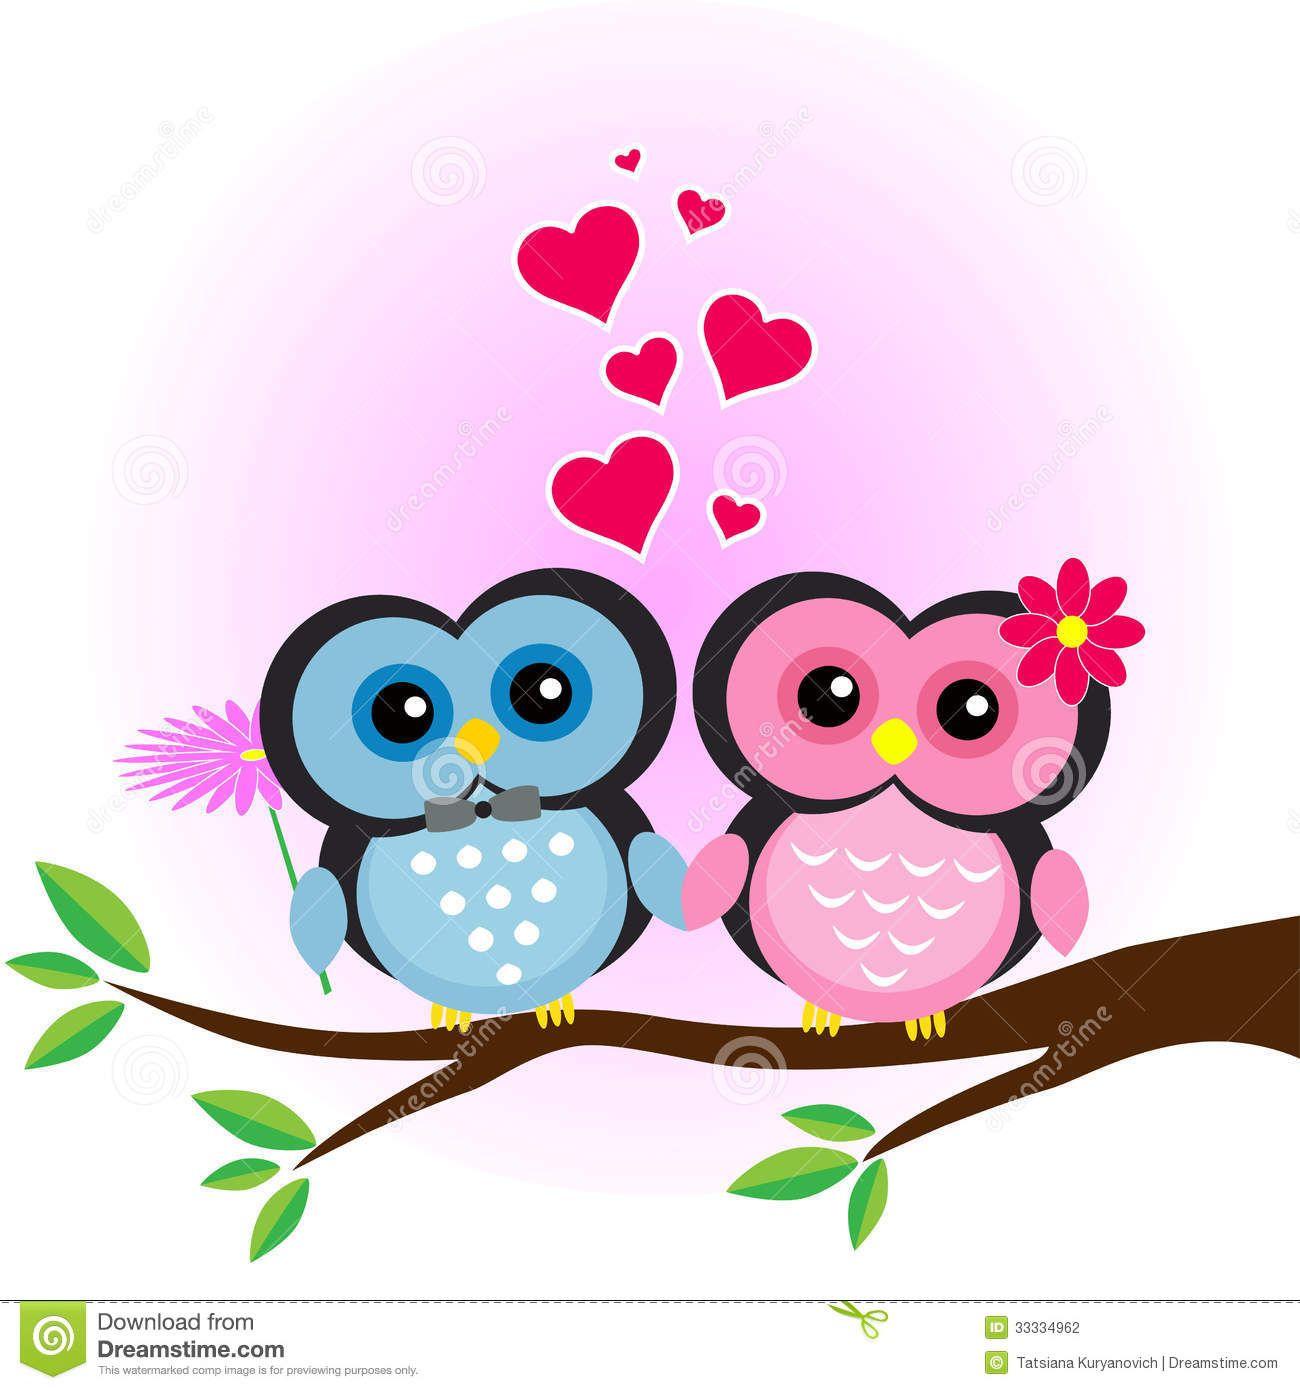 Buhos amor | Buhos cute | Pinterest | Amor y Animales